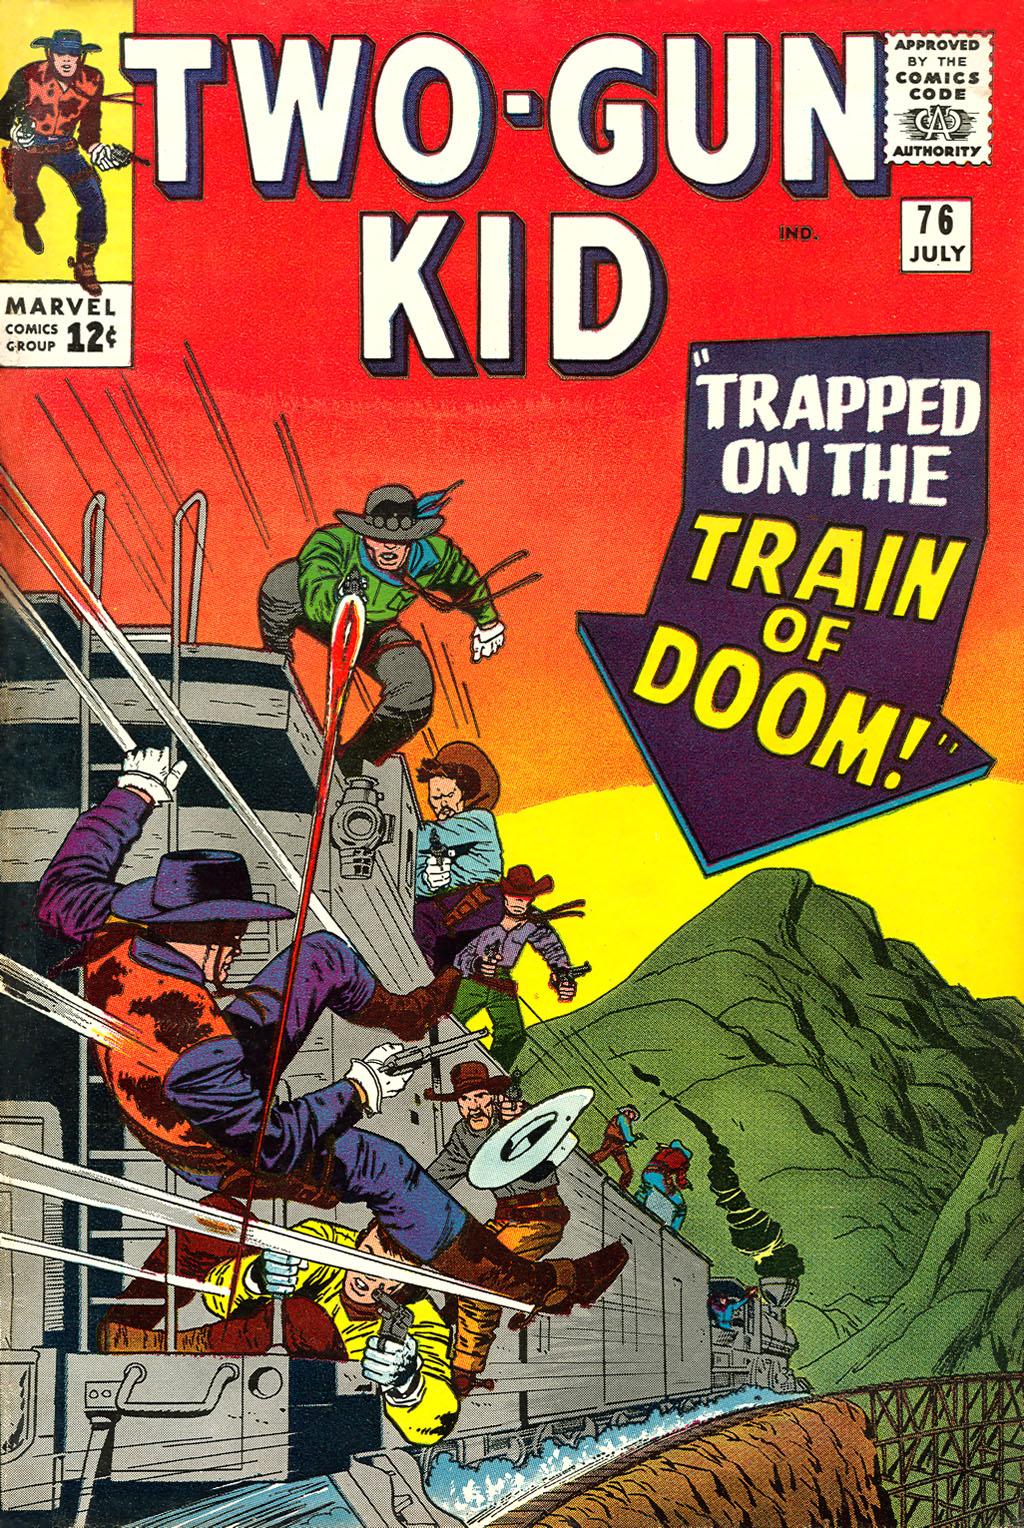 Read online Two-Gun Kid comic -  Issue #76 - 1